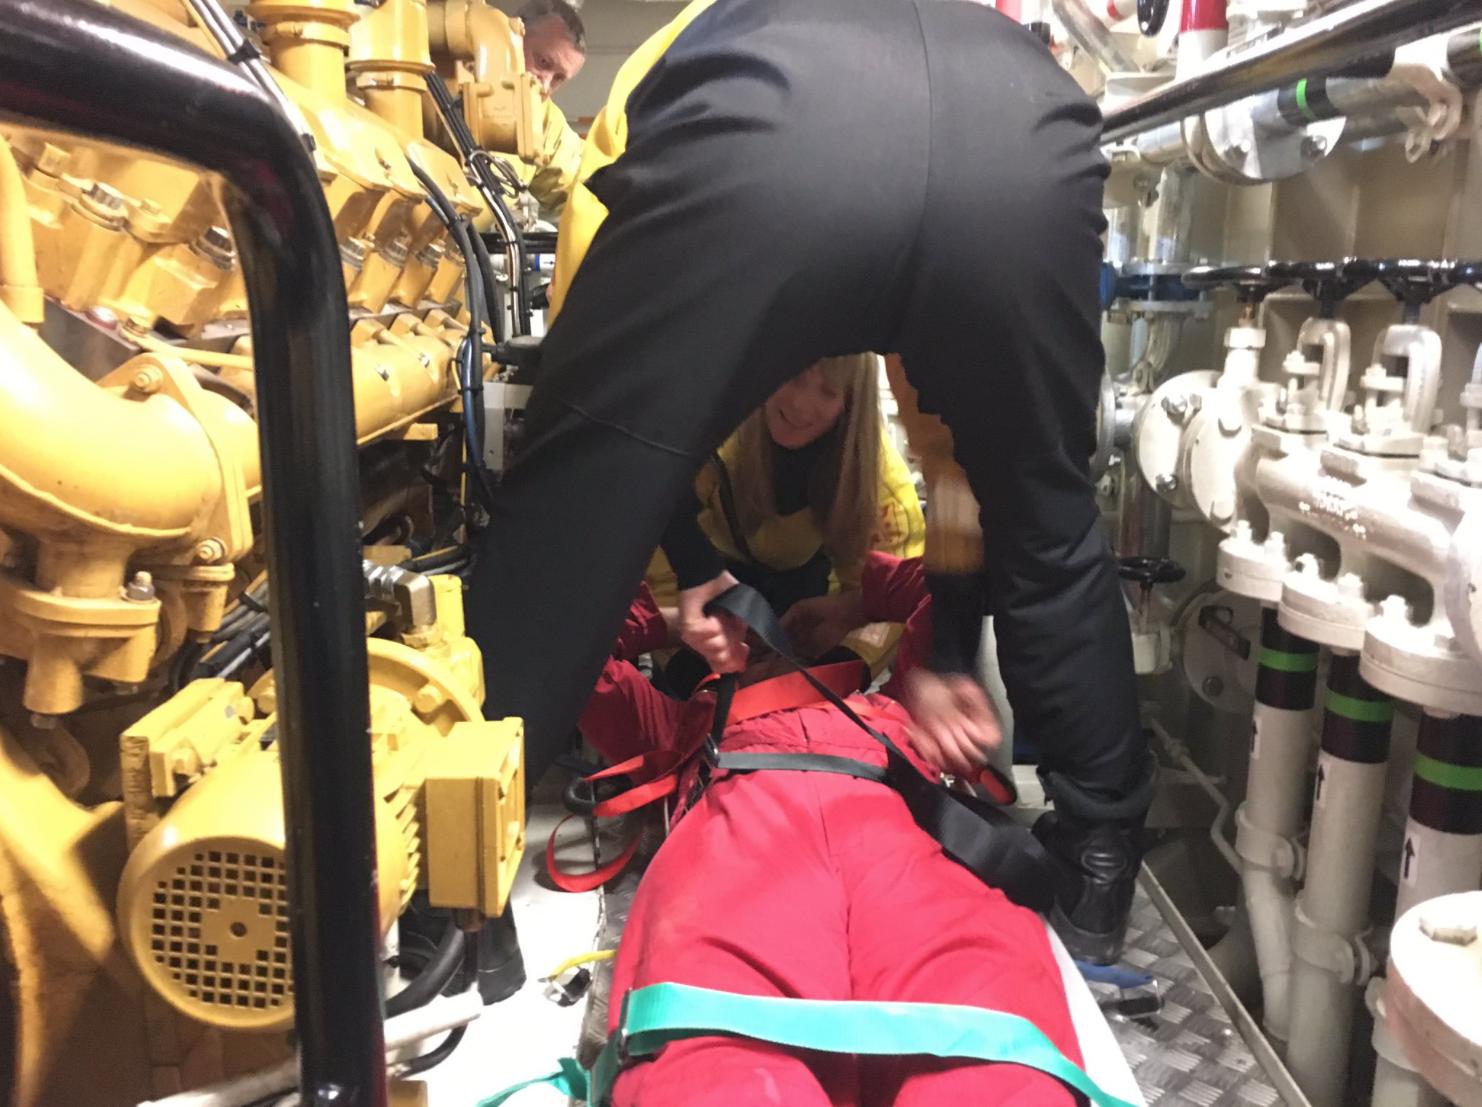 RNLI Confined Space Rescue